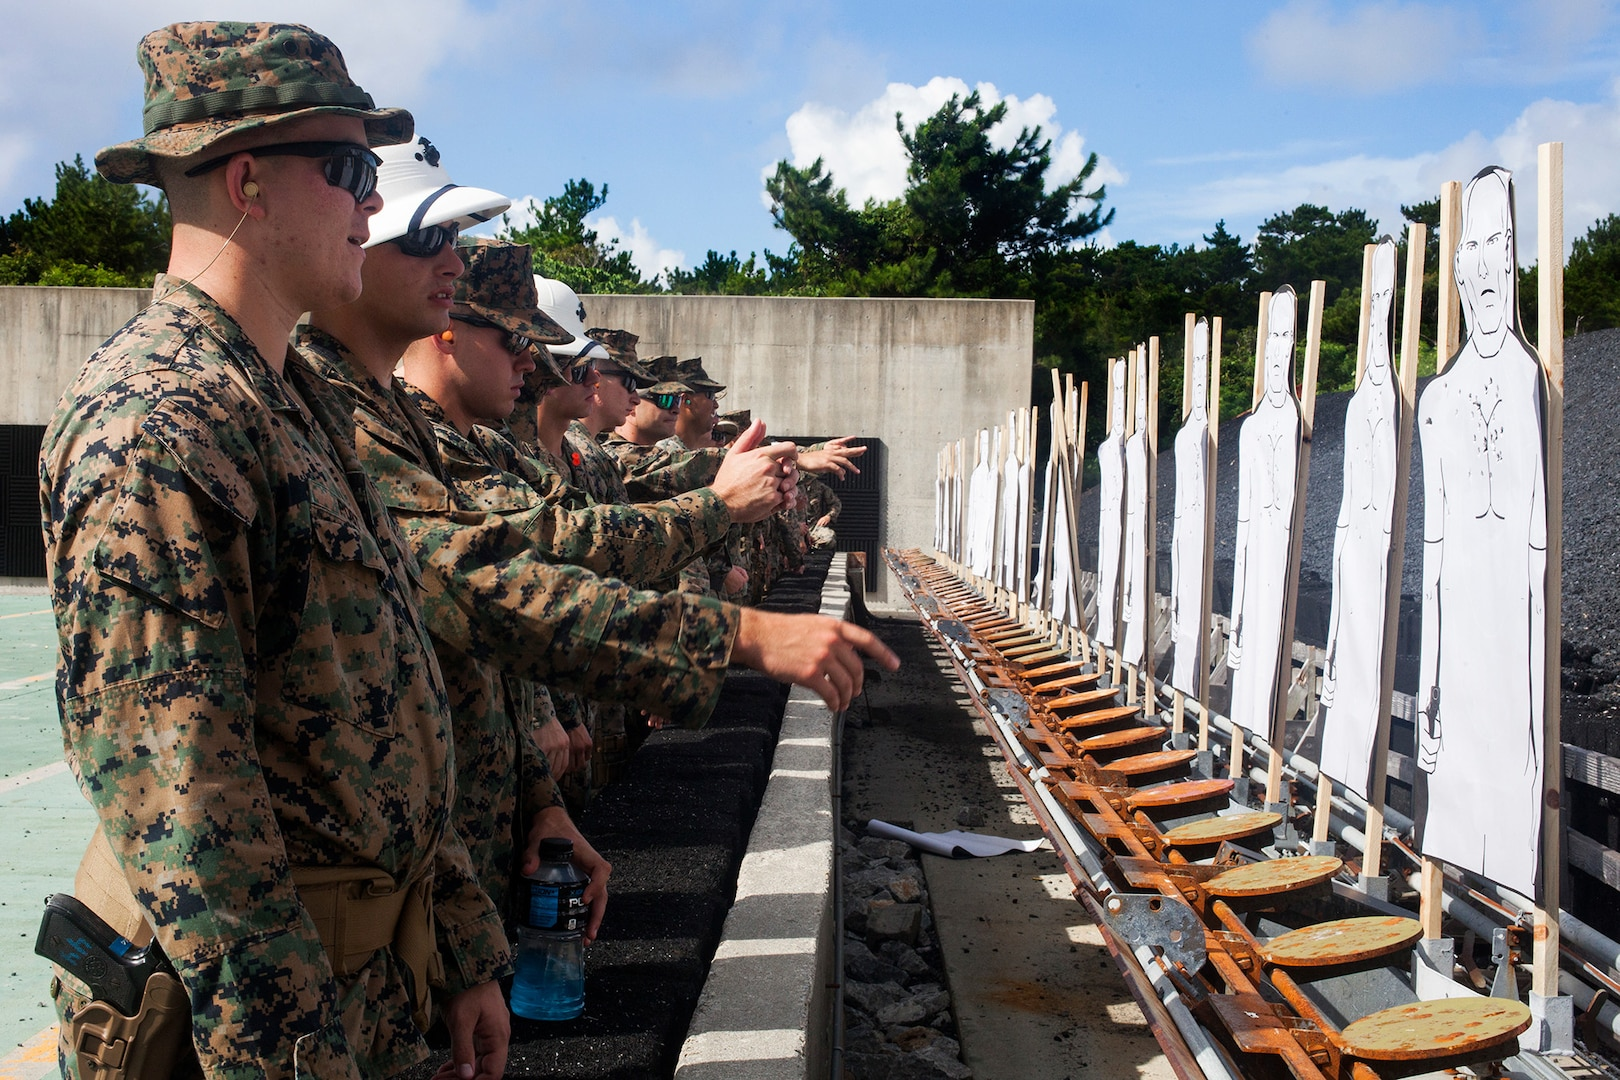 The Marine Corps Combat Pistol Program